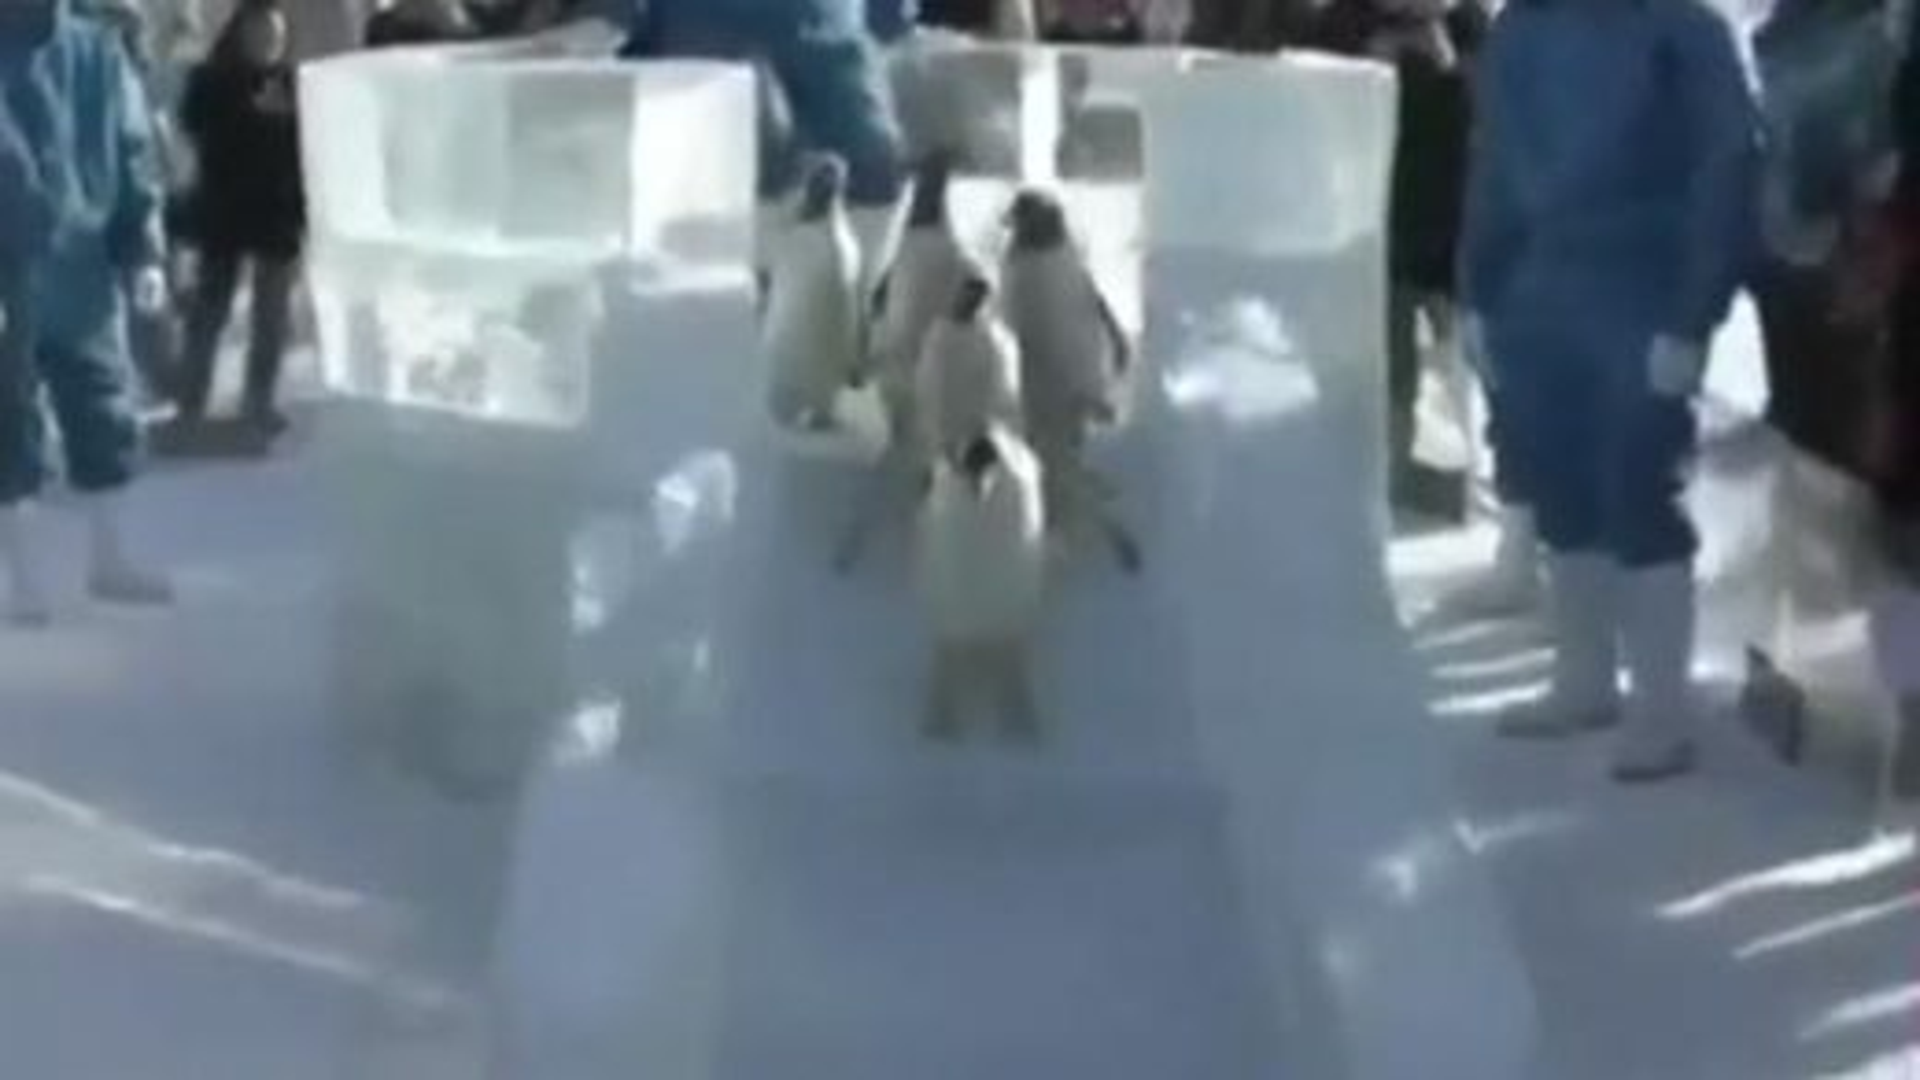 سرسره بازی پنگوئن | تگ